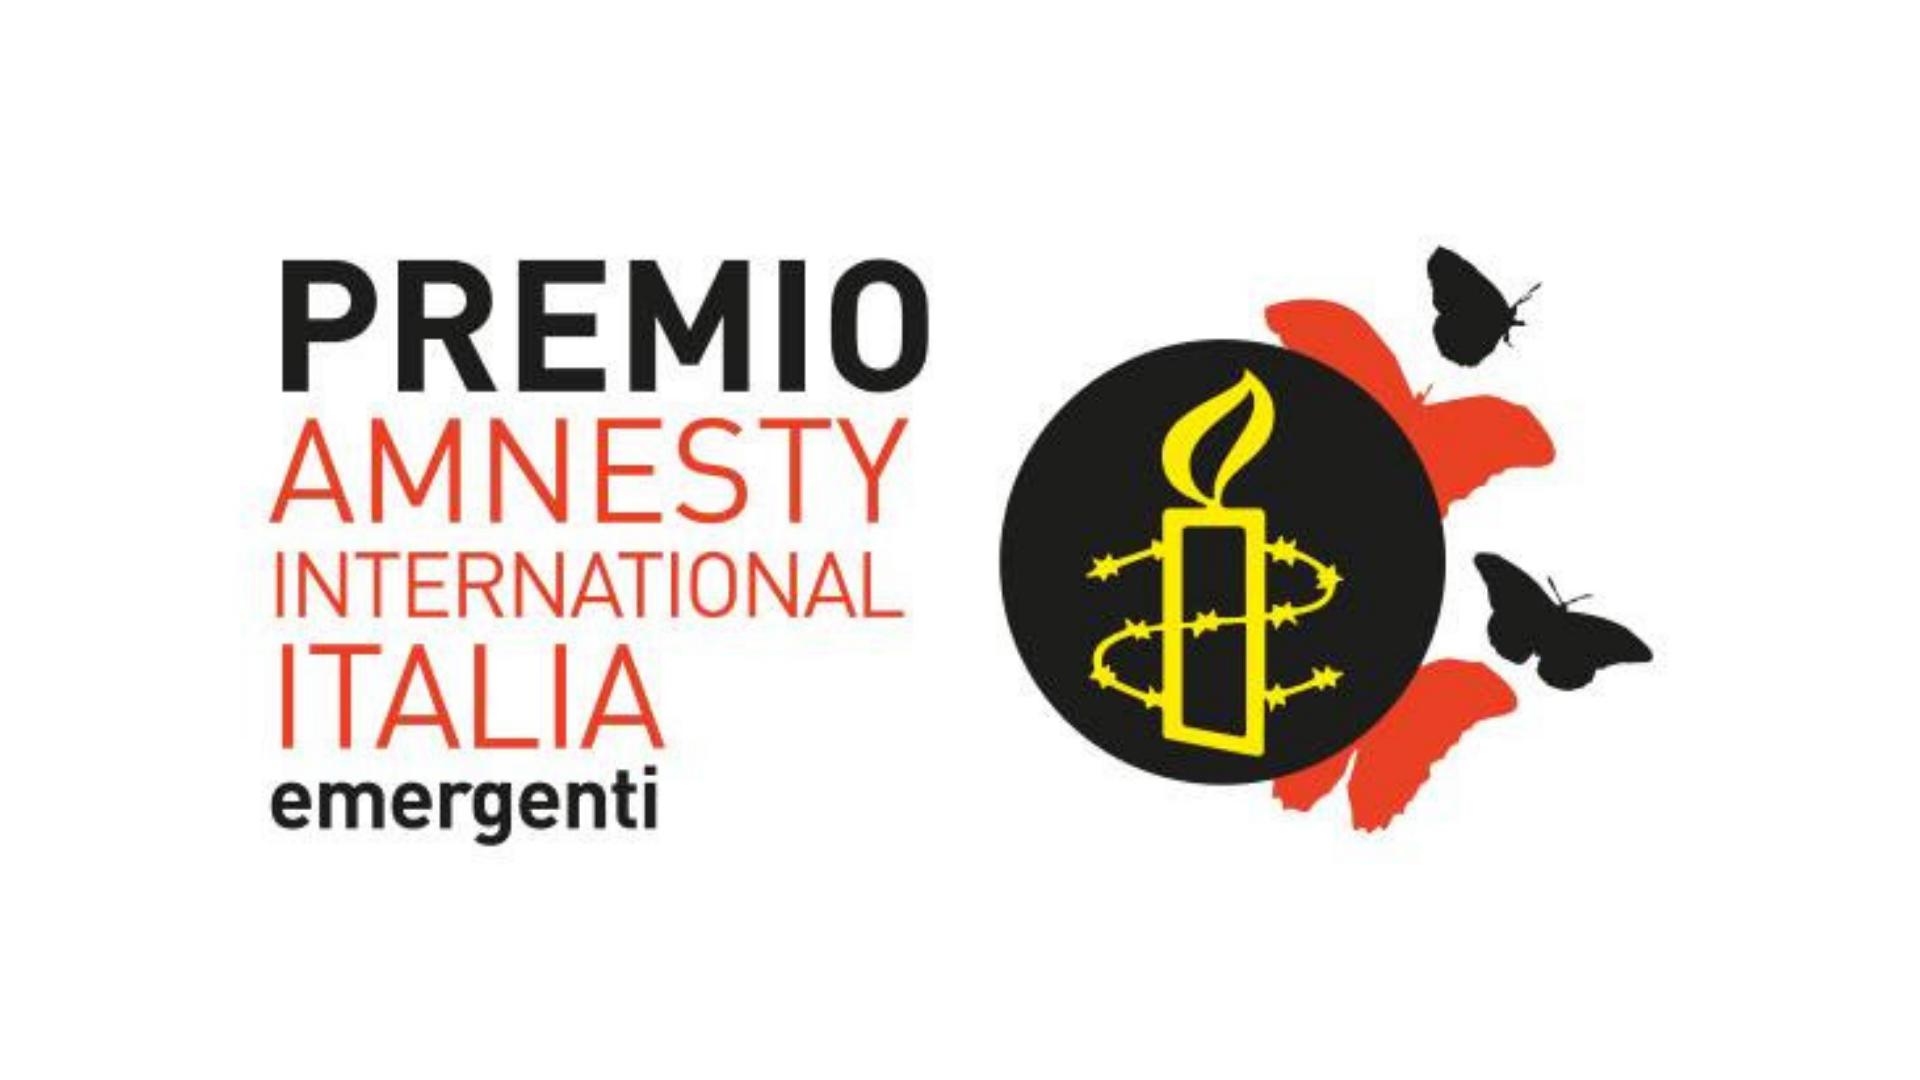 Premio Amnesty International Italia sezione Emergenti 2021